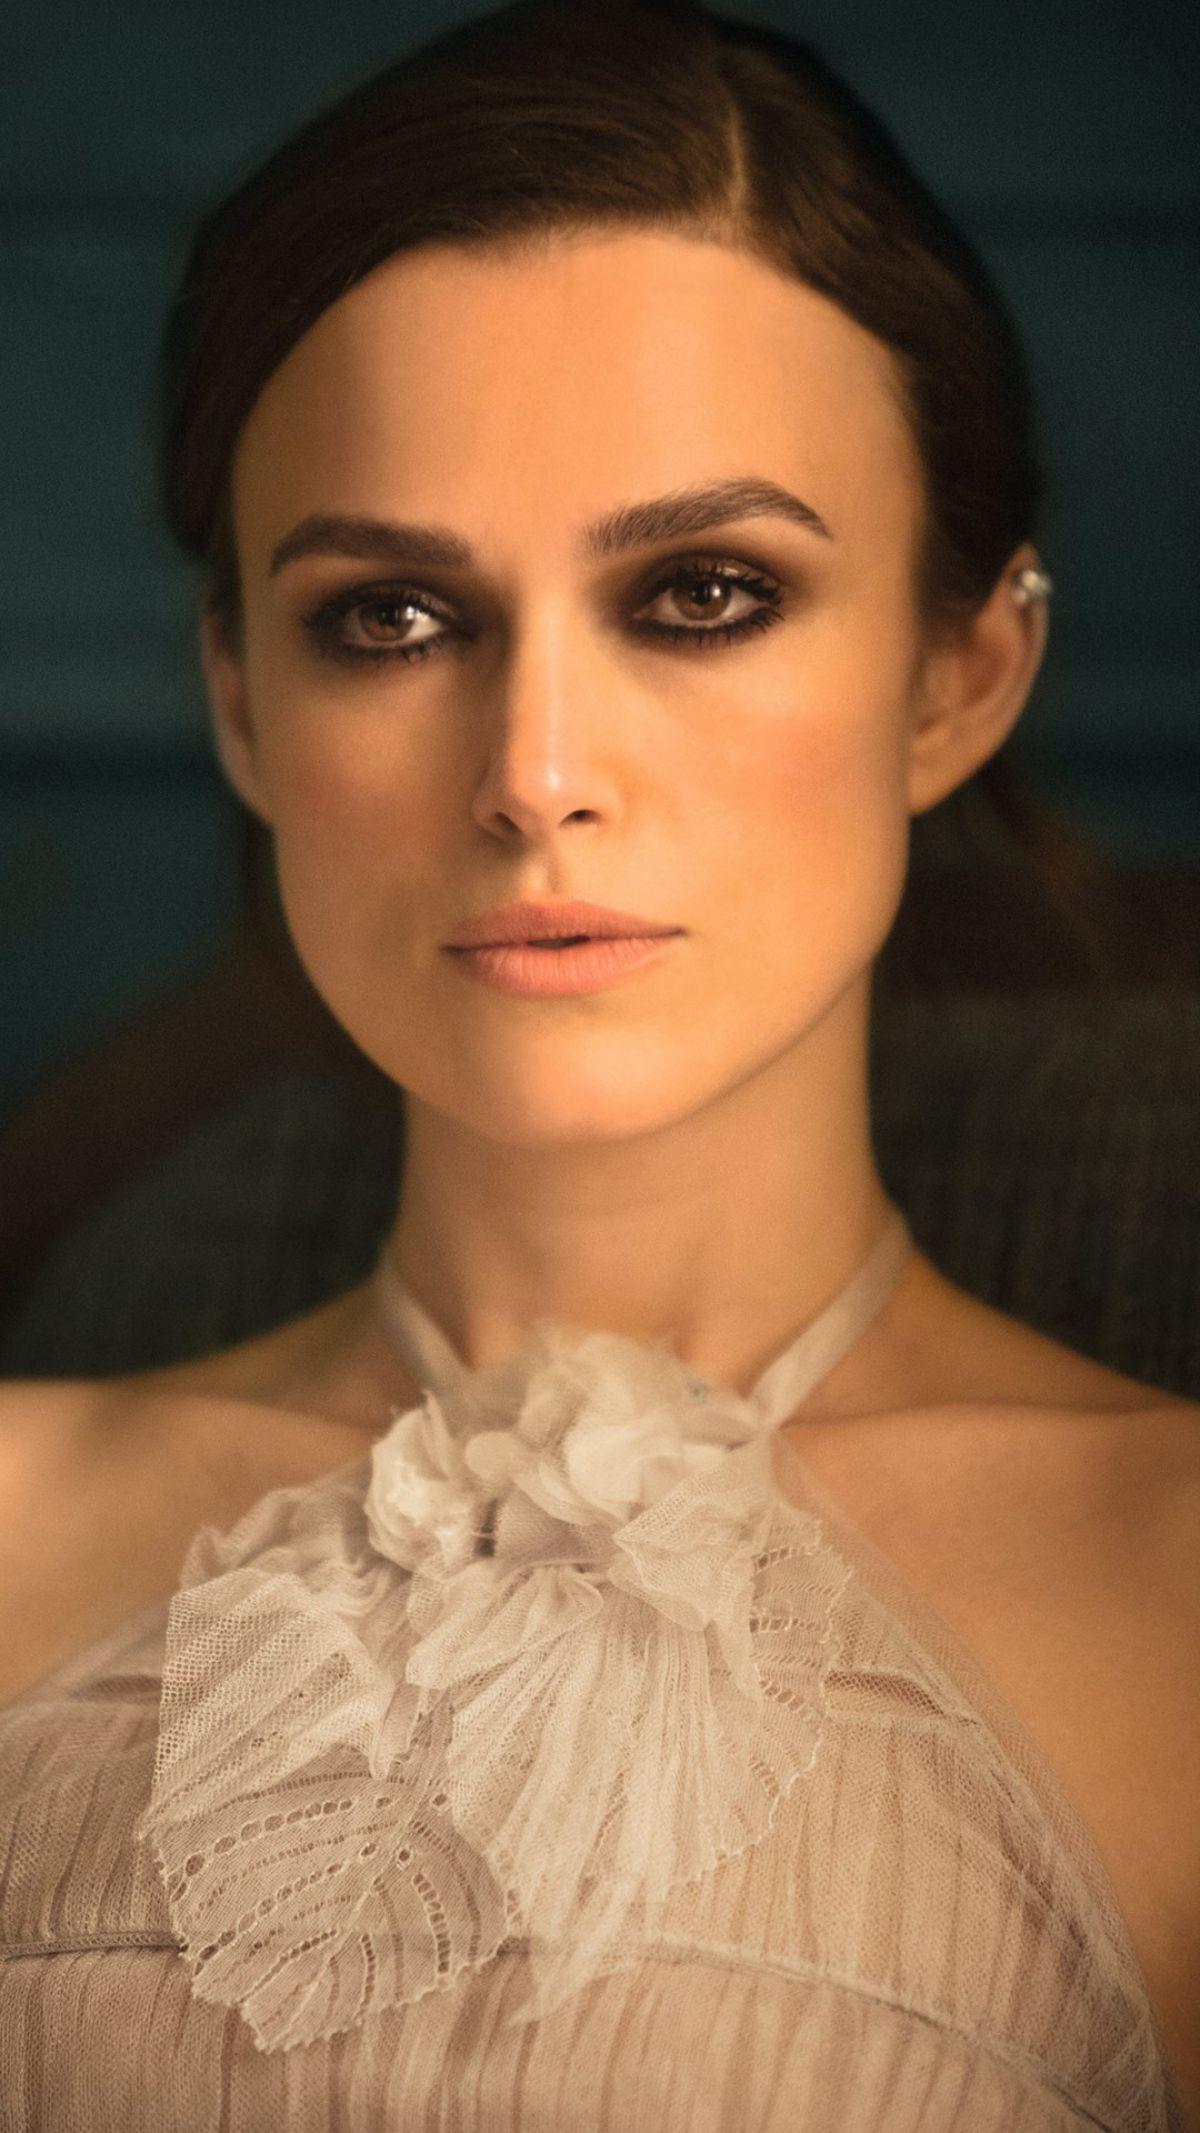 KEIRA KNIGHTLEY for Chanel Coco Mademoiselle Eau De Parfum ...